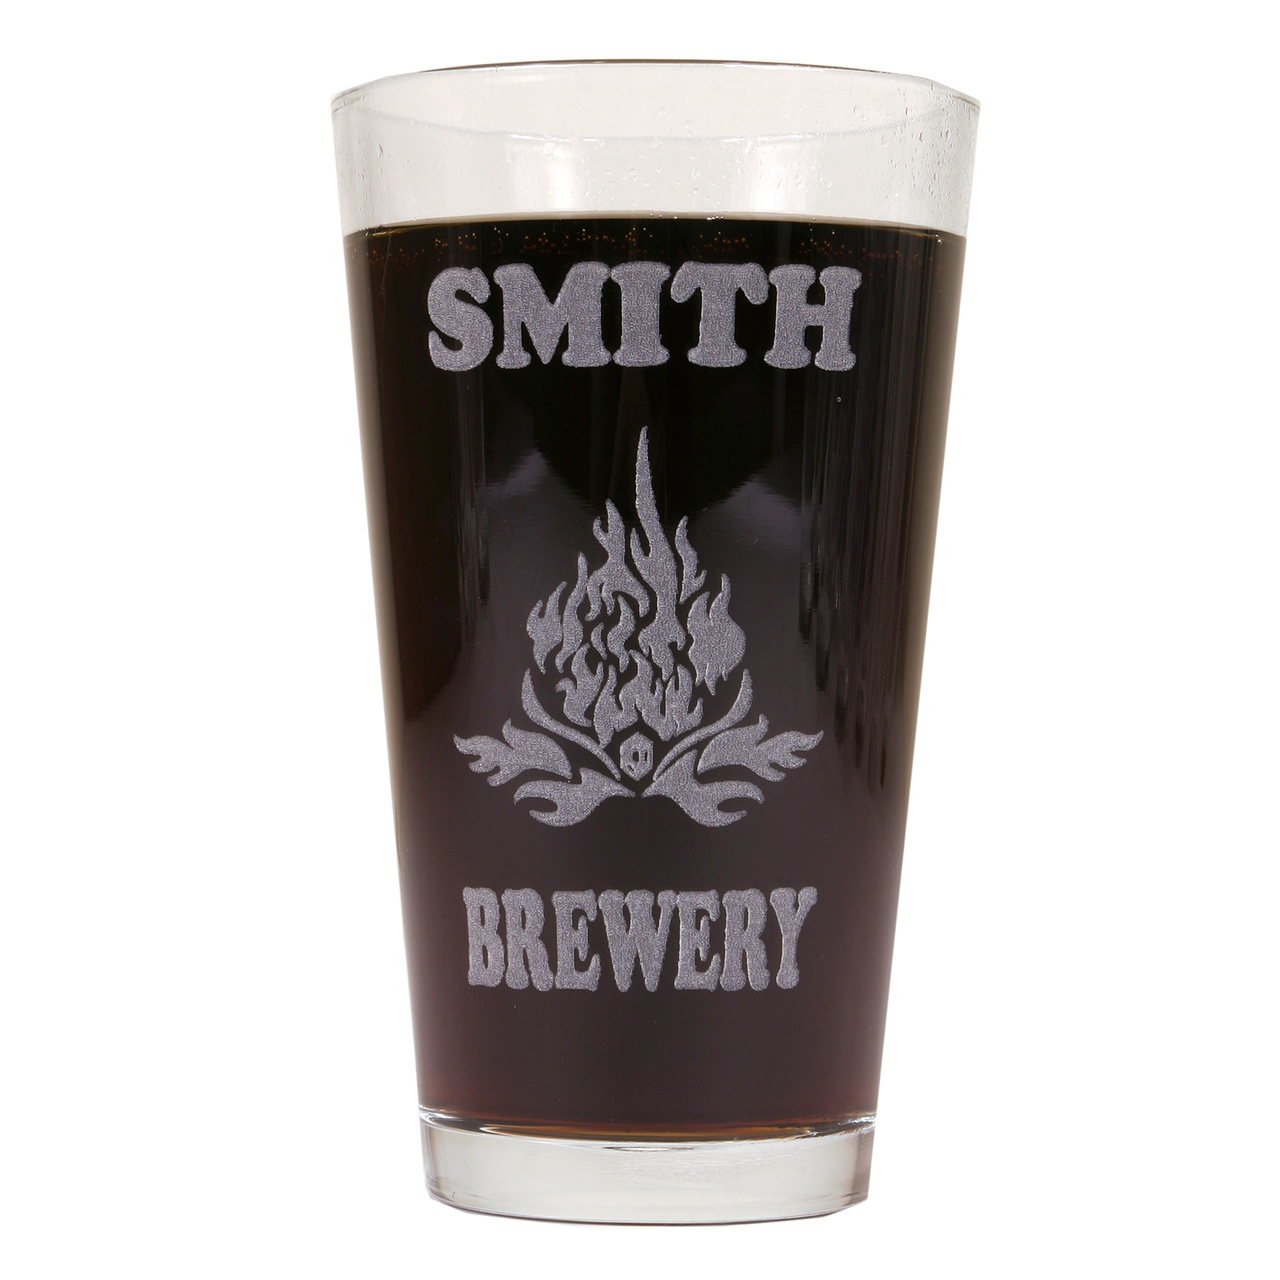 Hot Dog Personalized Pint Glass Beer Mug - Flames